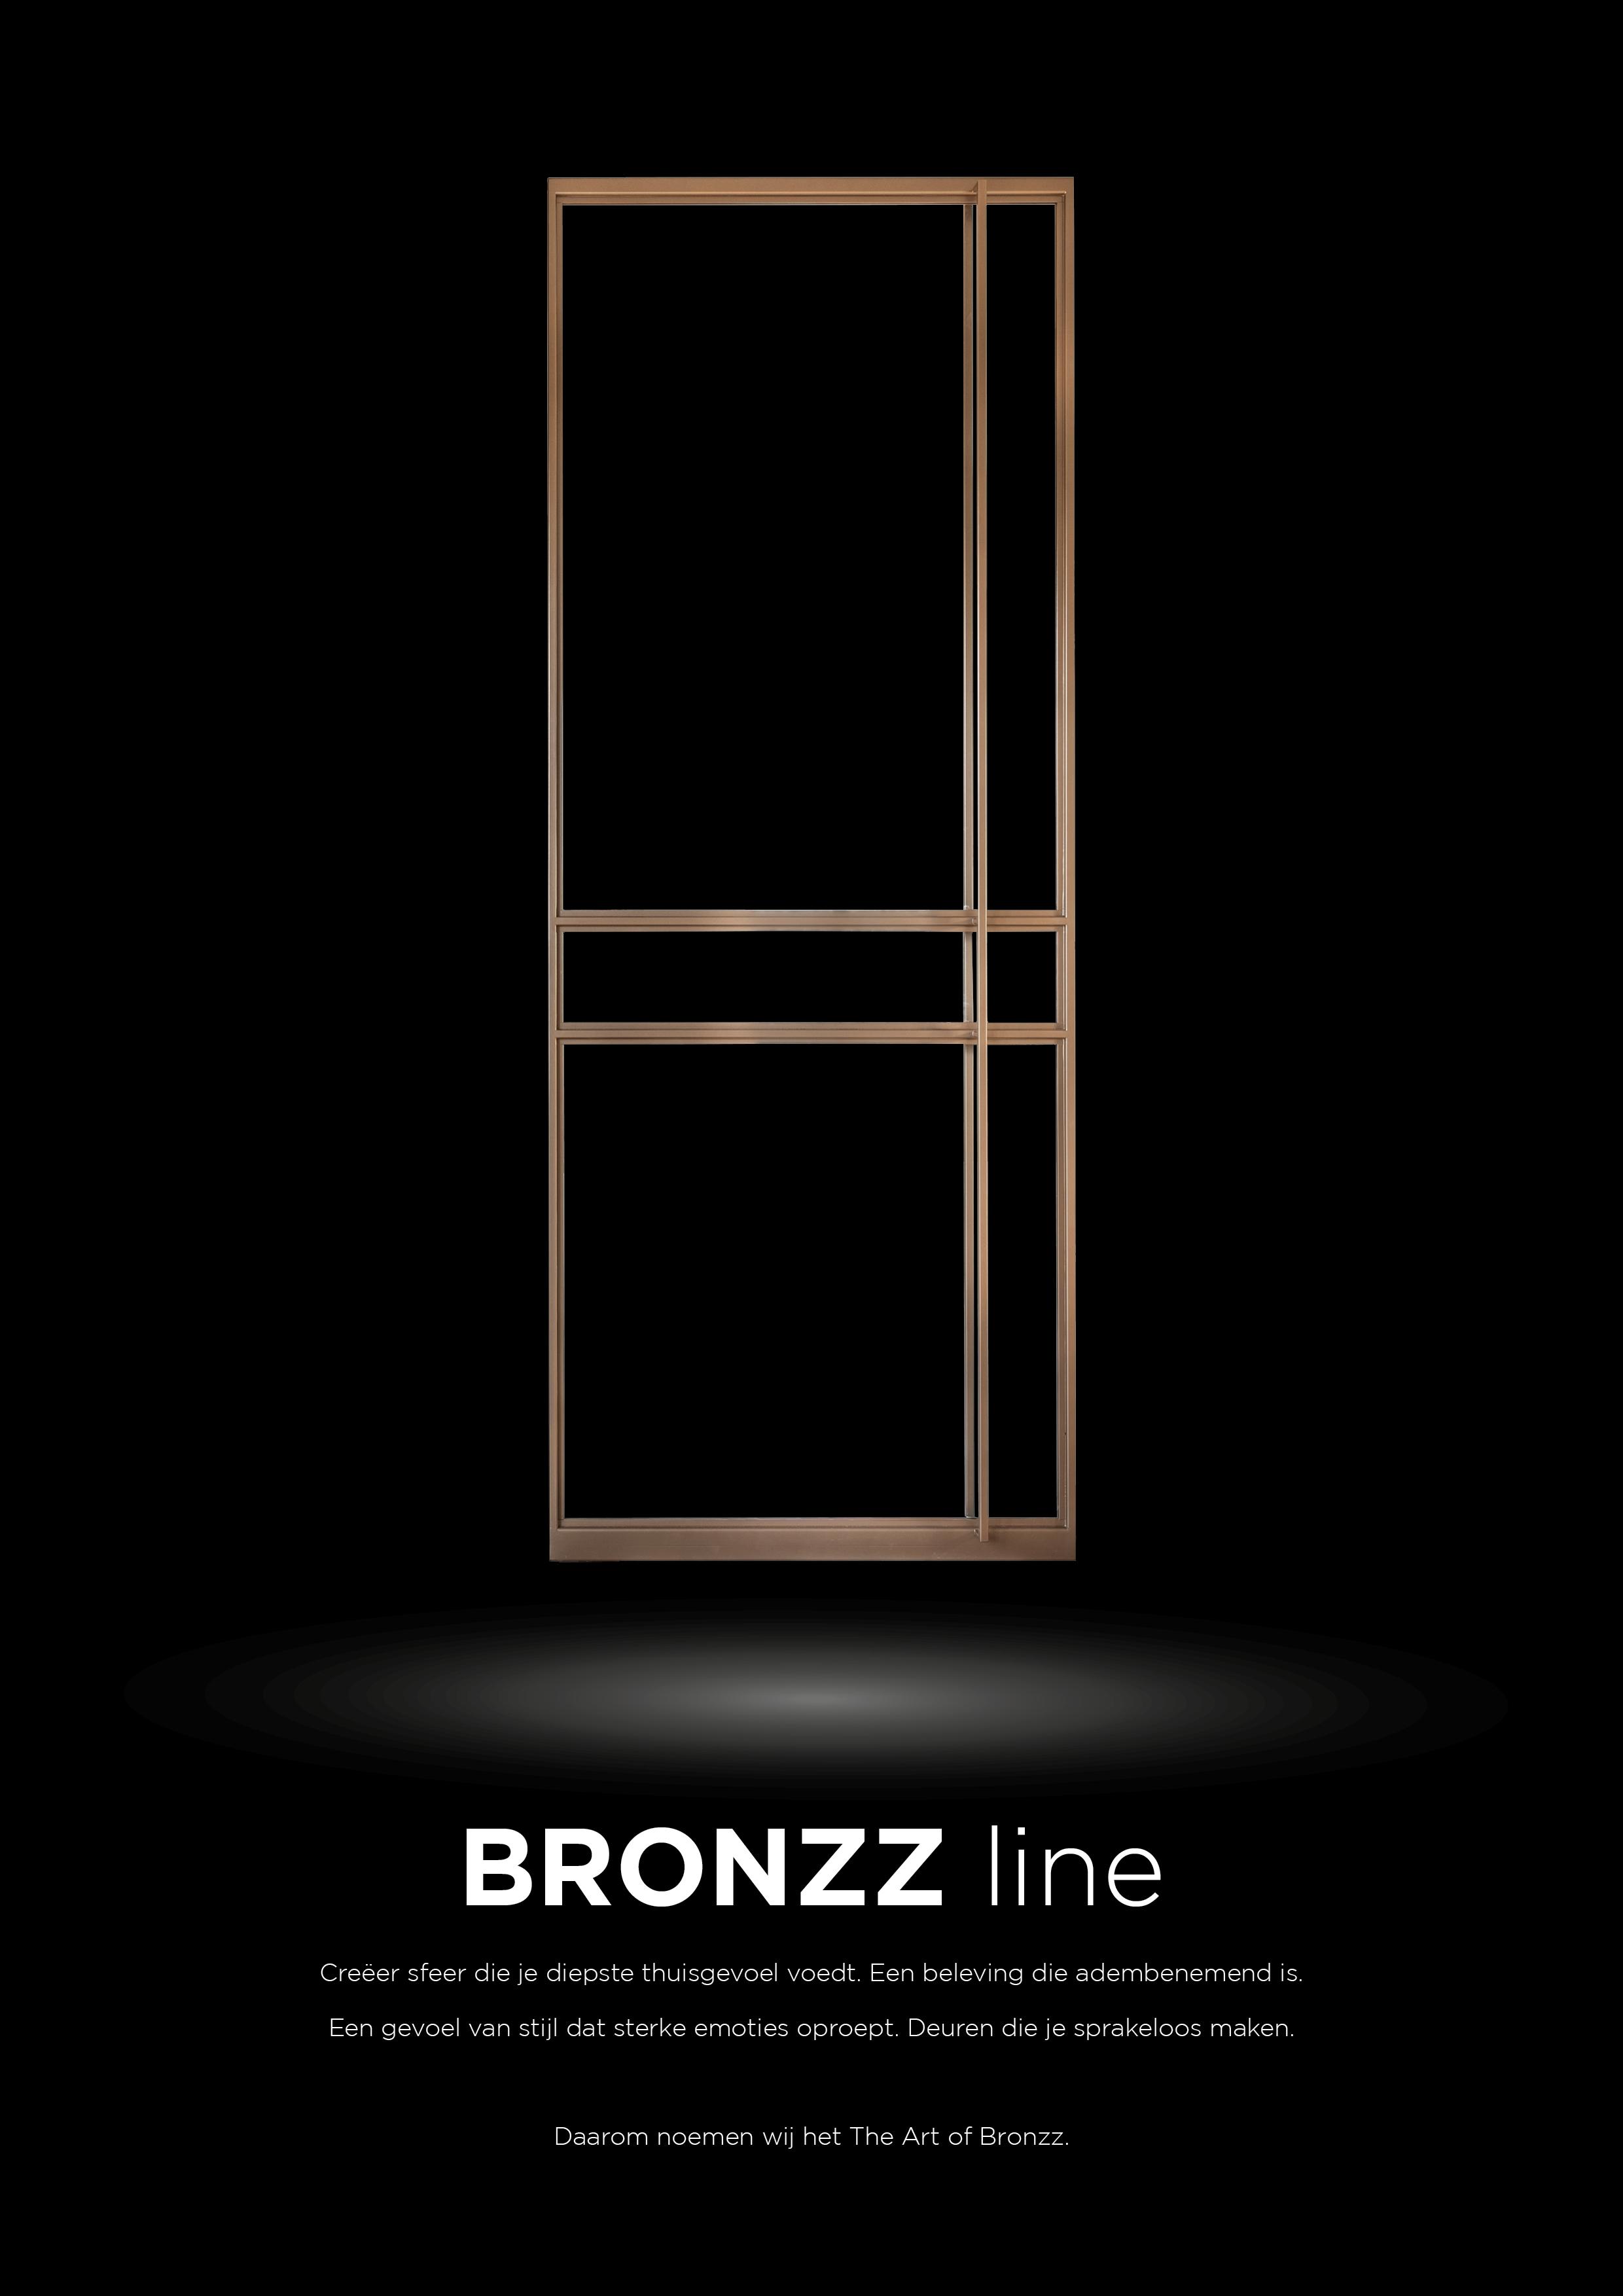 Bronzz-Line